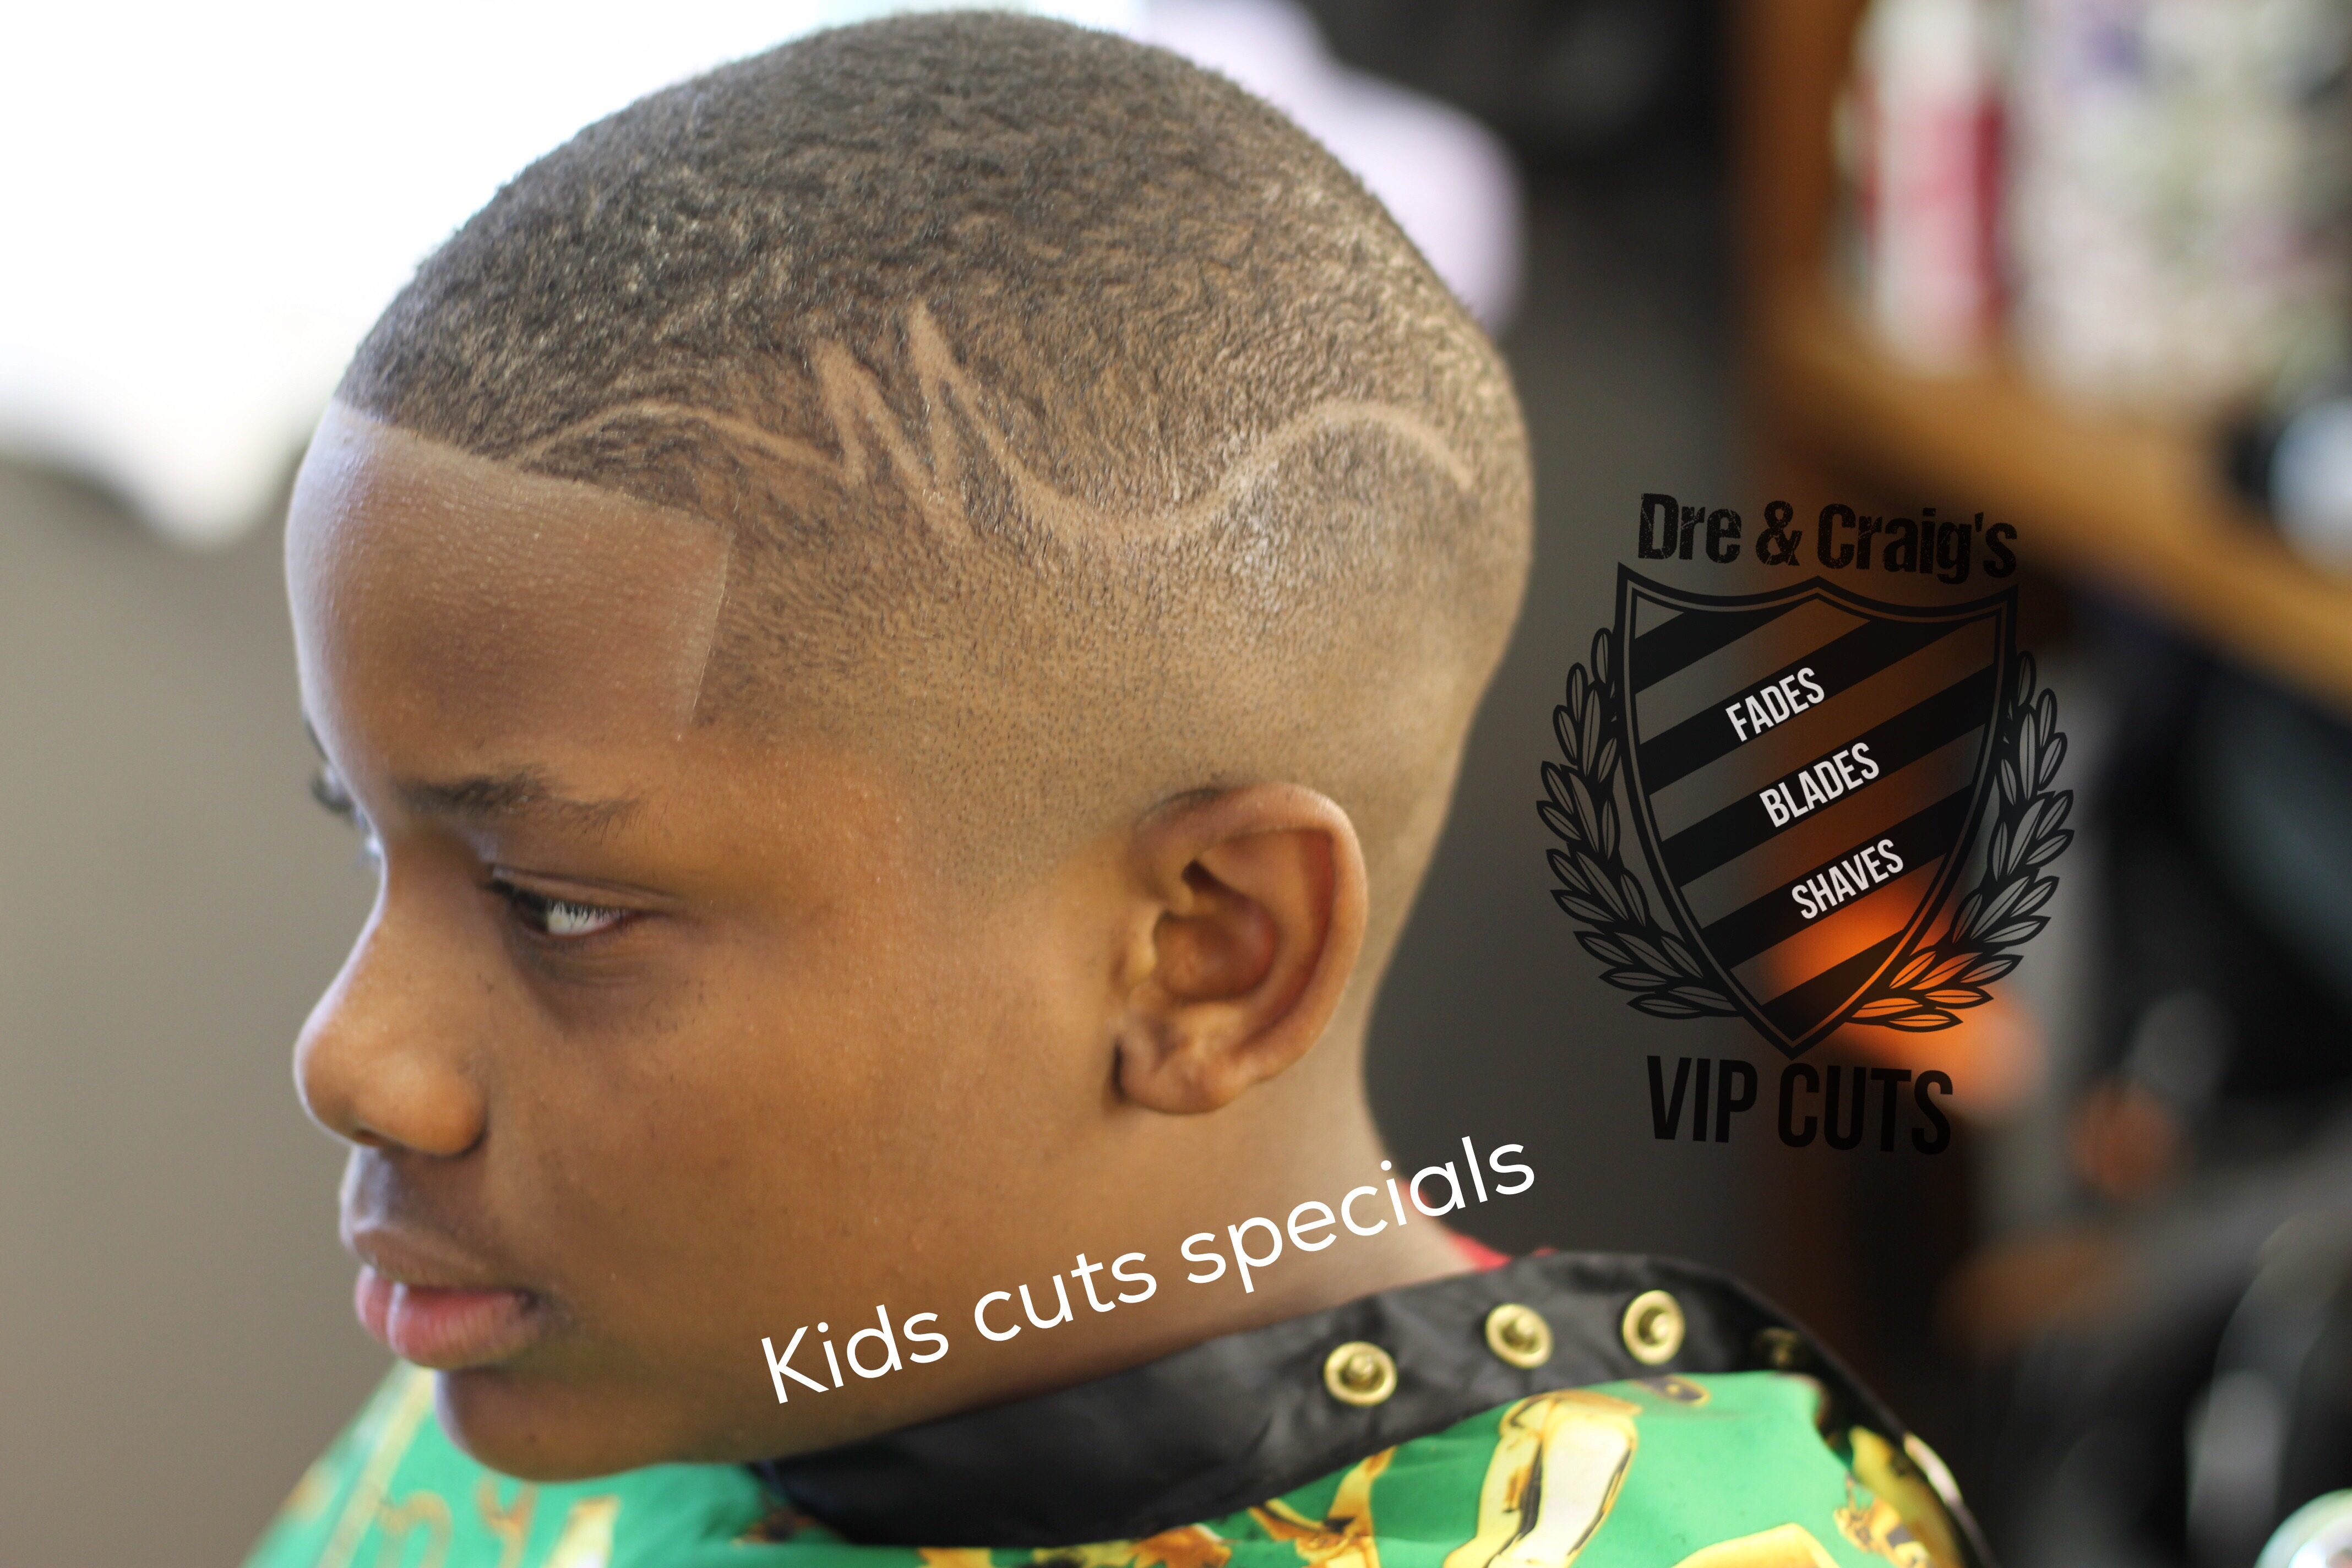 Mcdonough Mens Haircuts Dre Craigs Vip Cuts